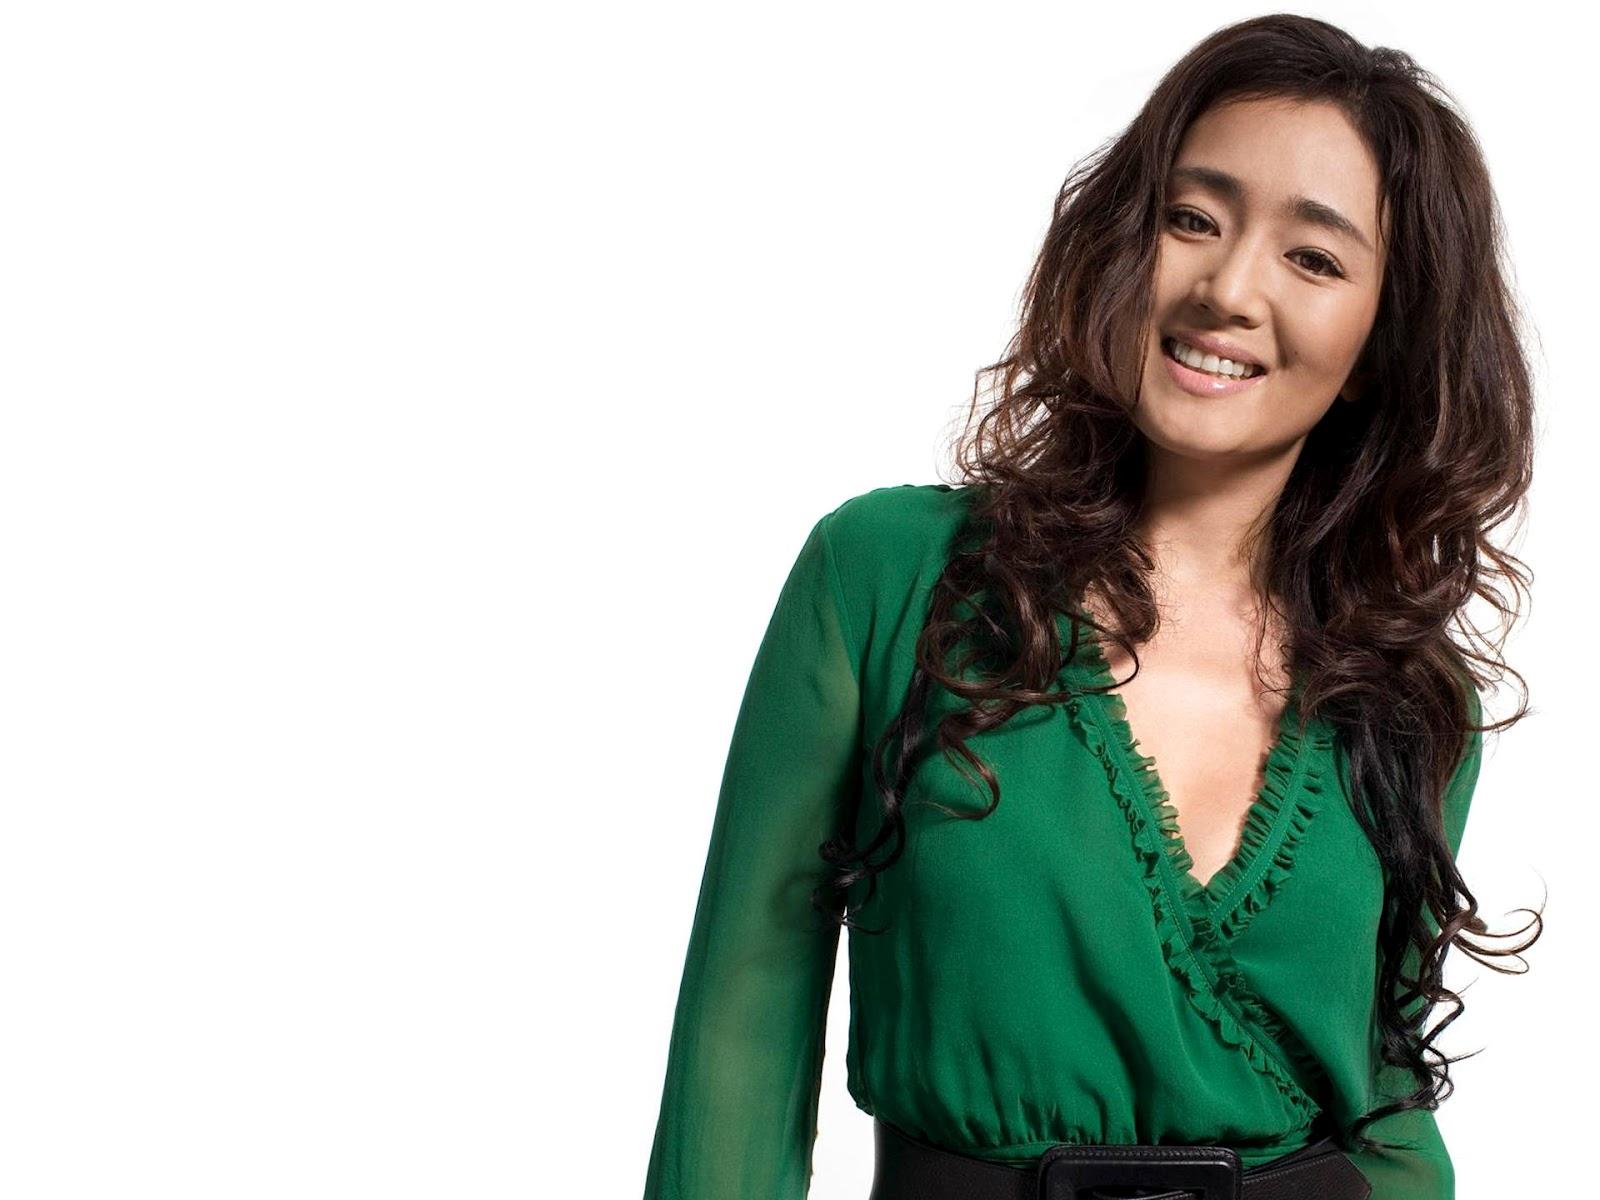 HD Wallpapers Gong Li | Gong li | Pinterest | Actresses, Sweet and ...